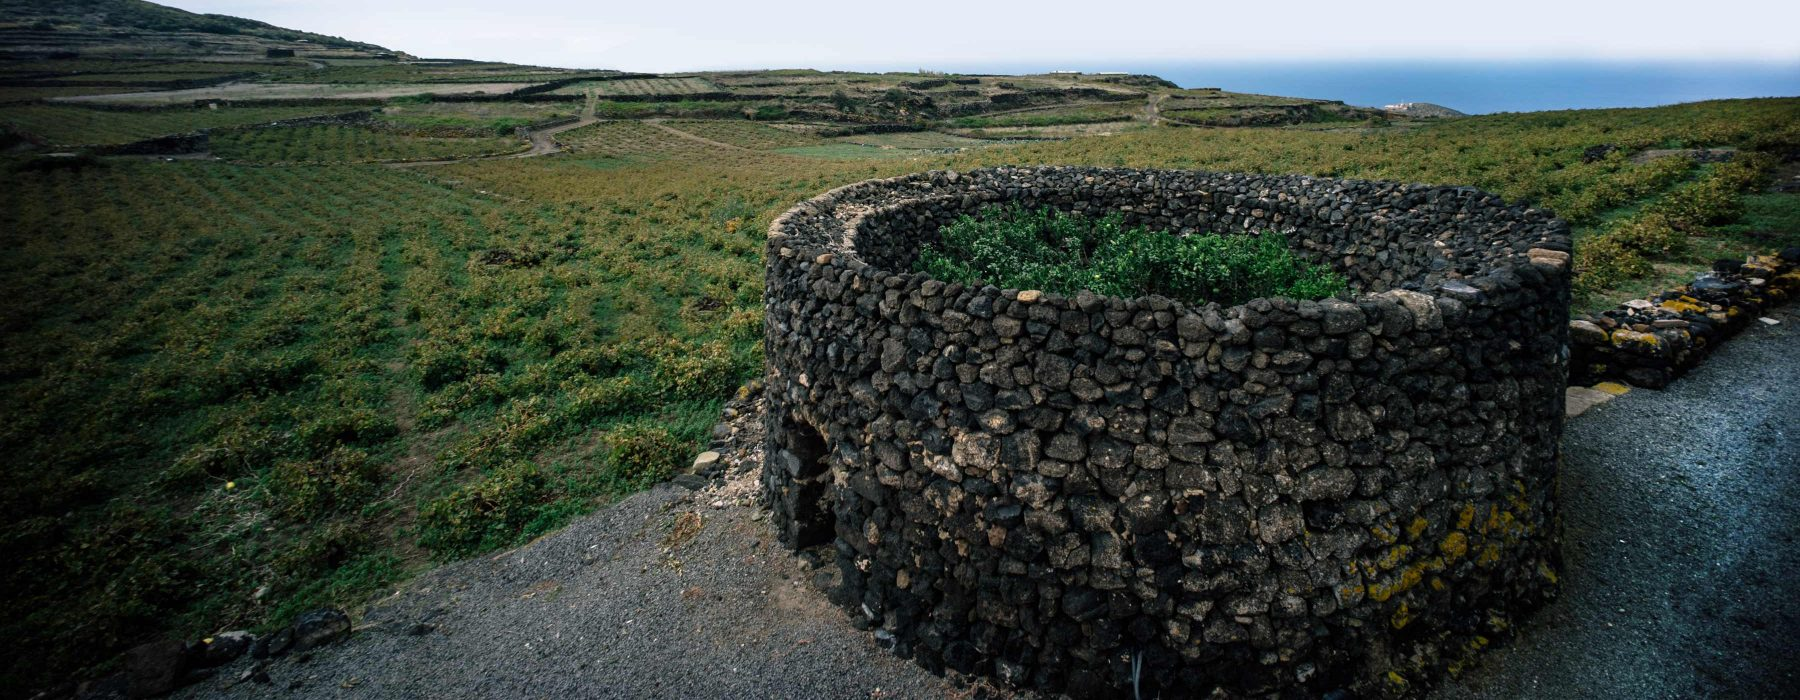 Pantelleria: una storia lunga 3000 anni… i giardini panteschi